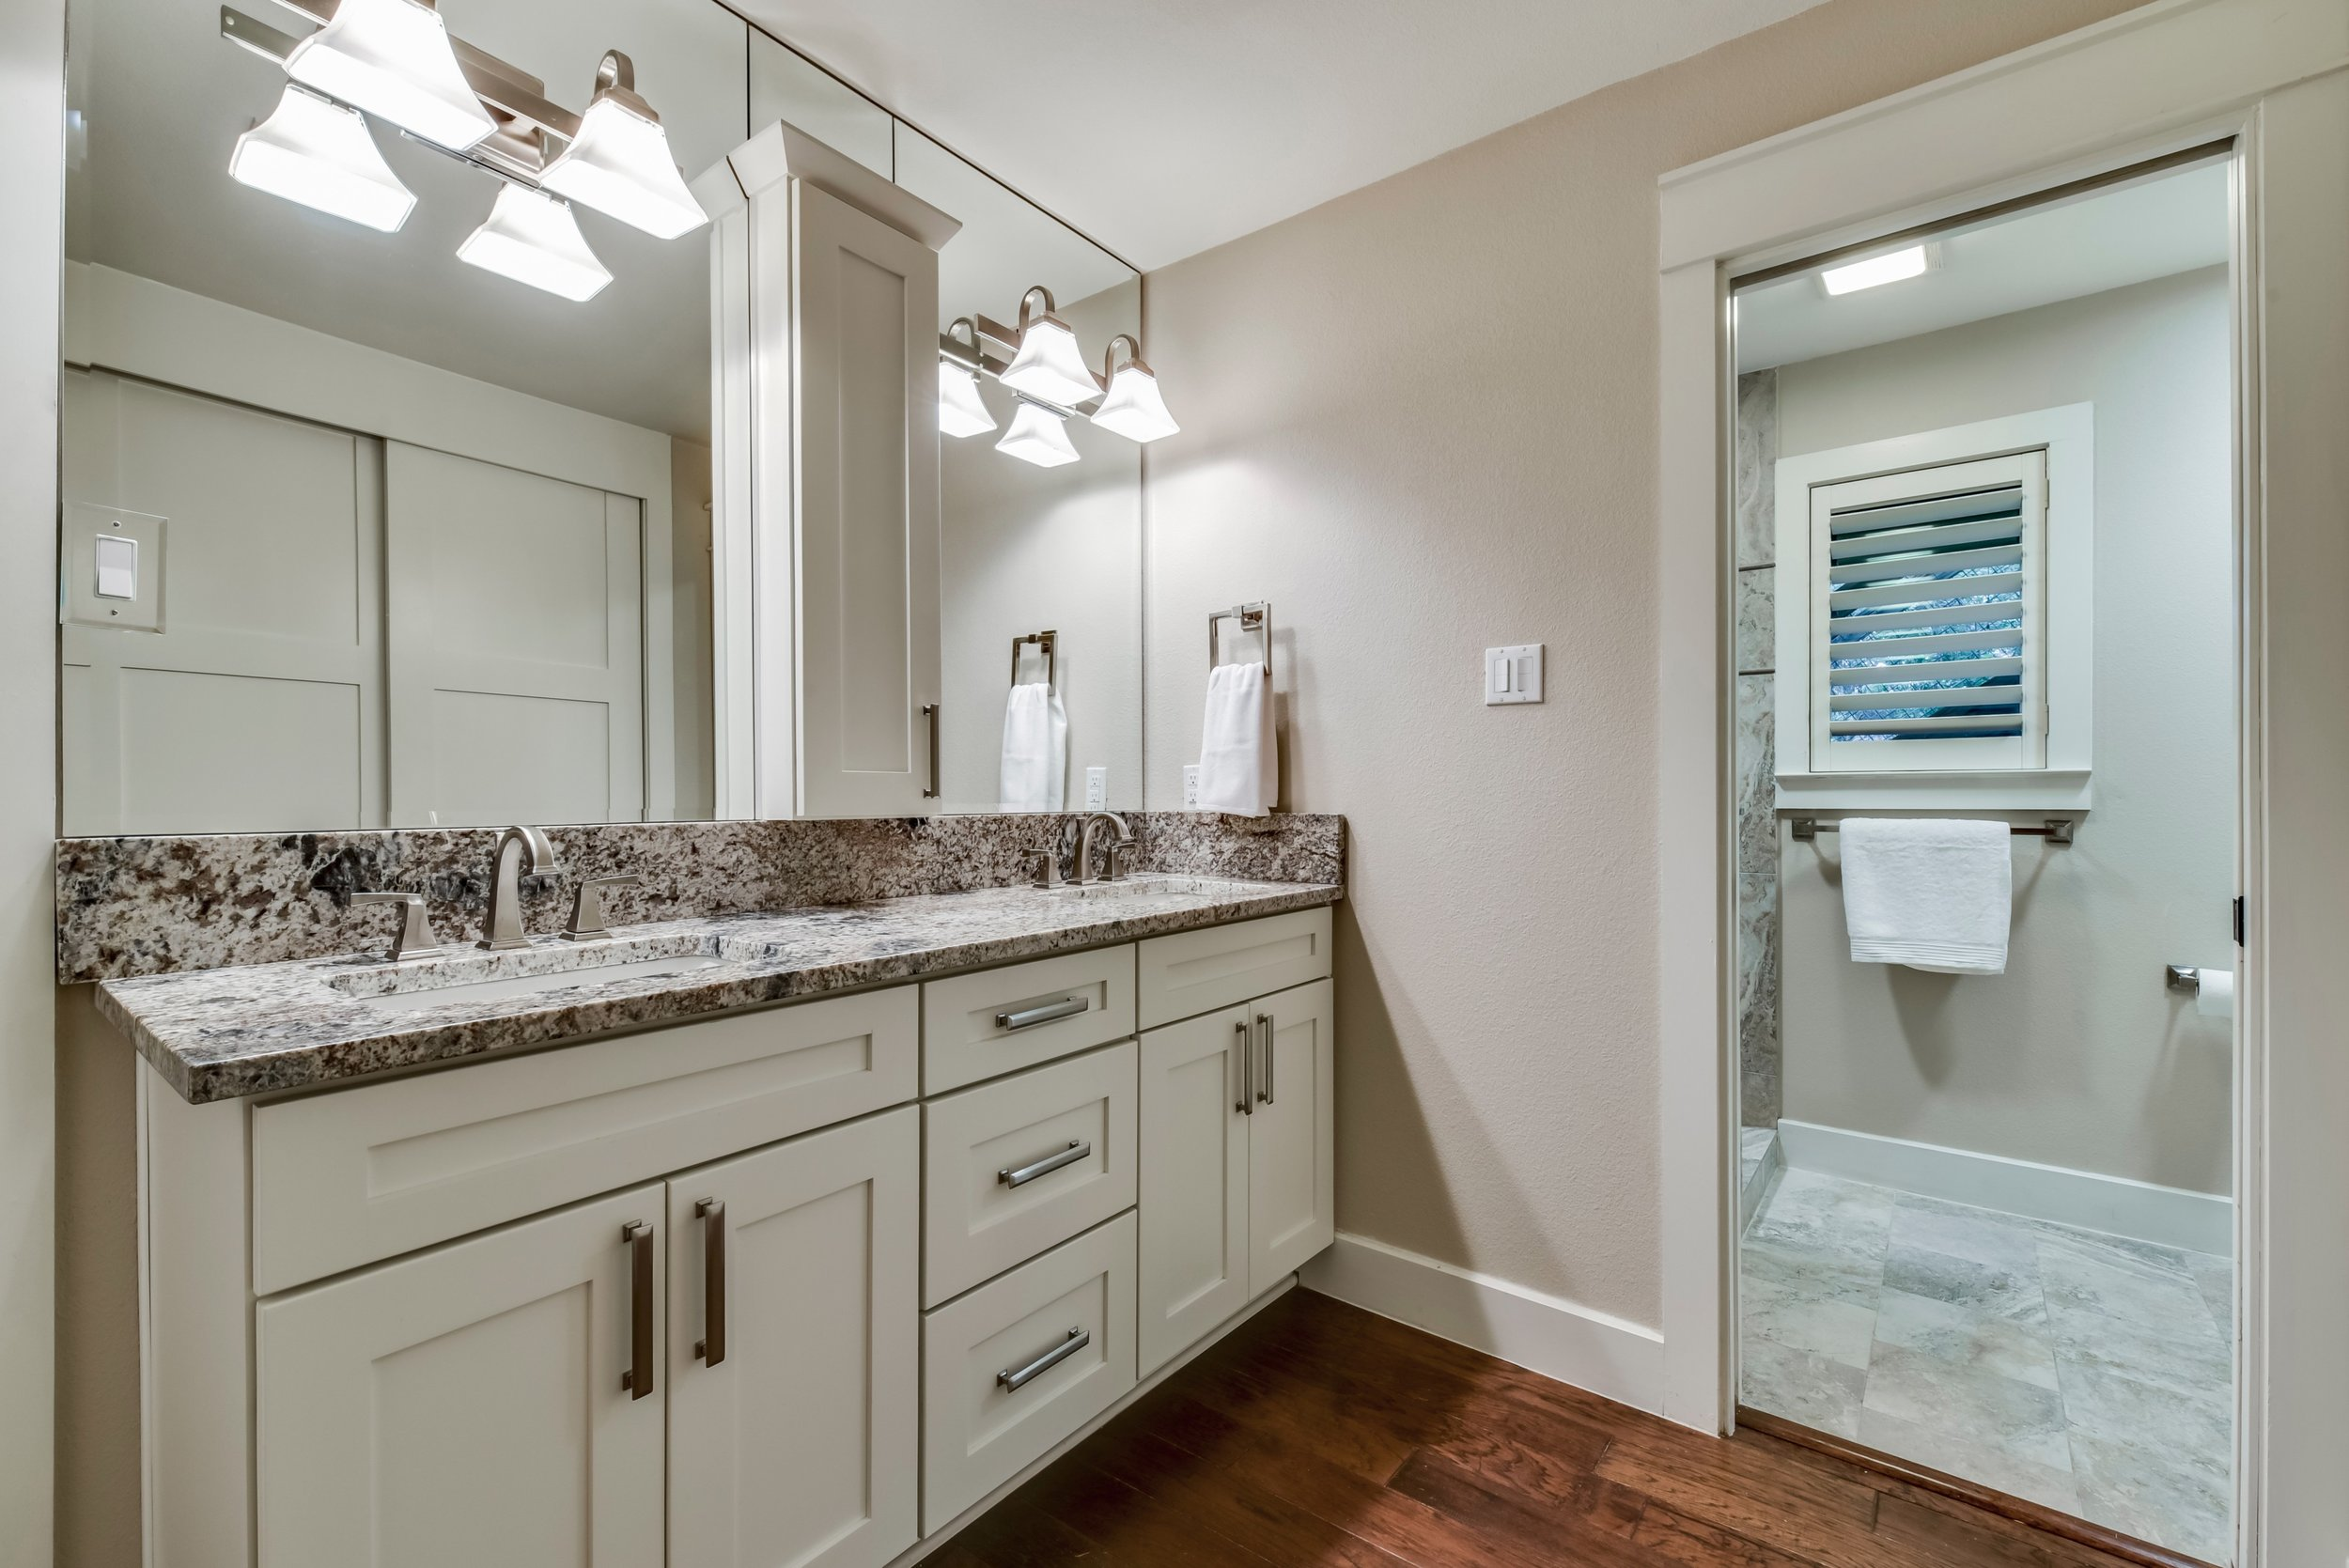 Bathroom Design with Vanity Lighting